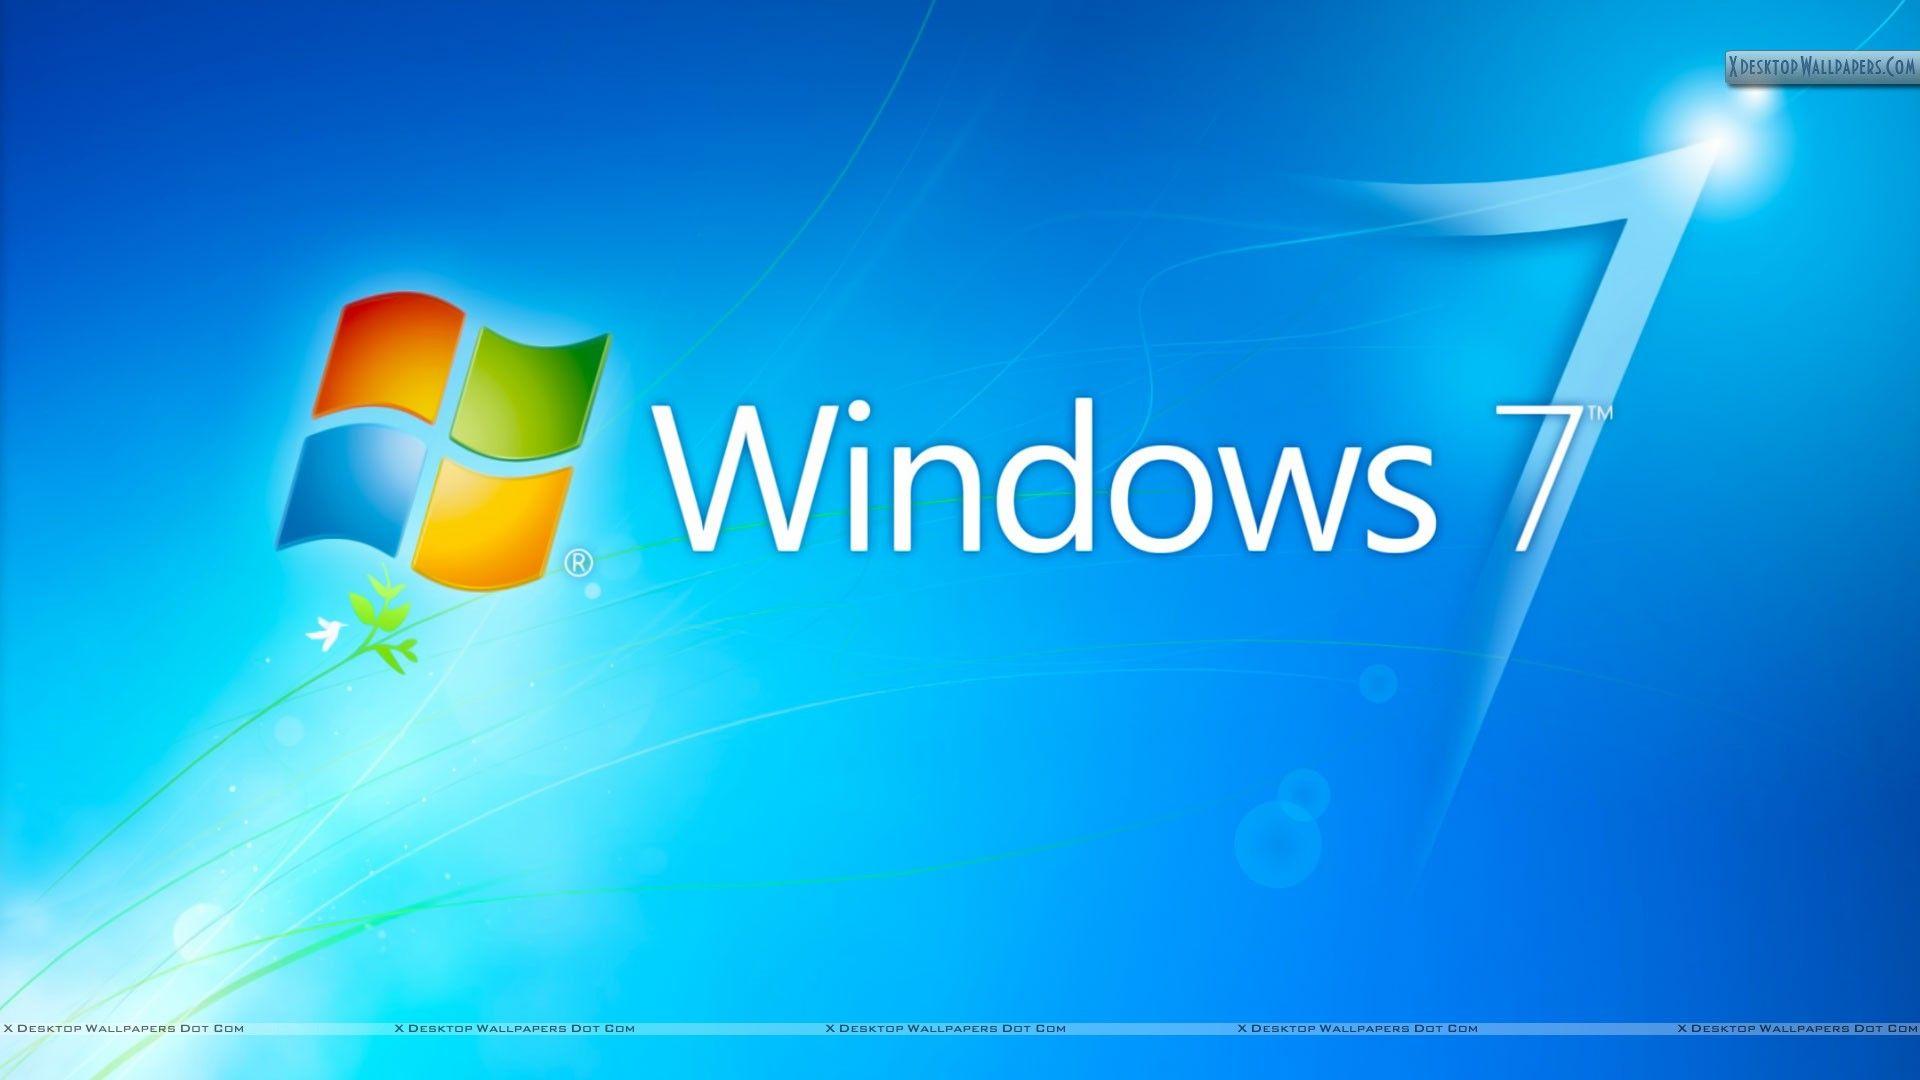 windows ultimate wallpapers hd wallpapers | desktops | pinterest